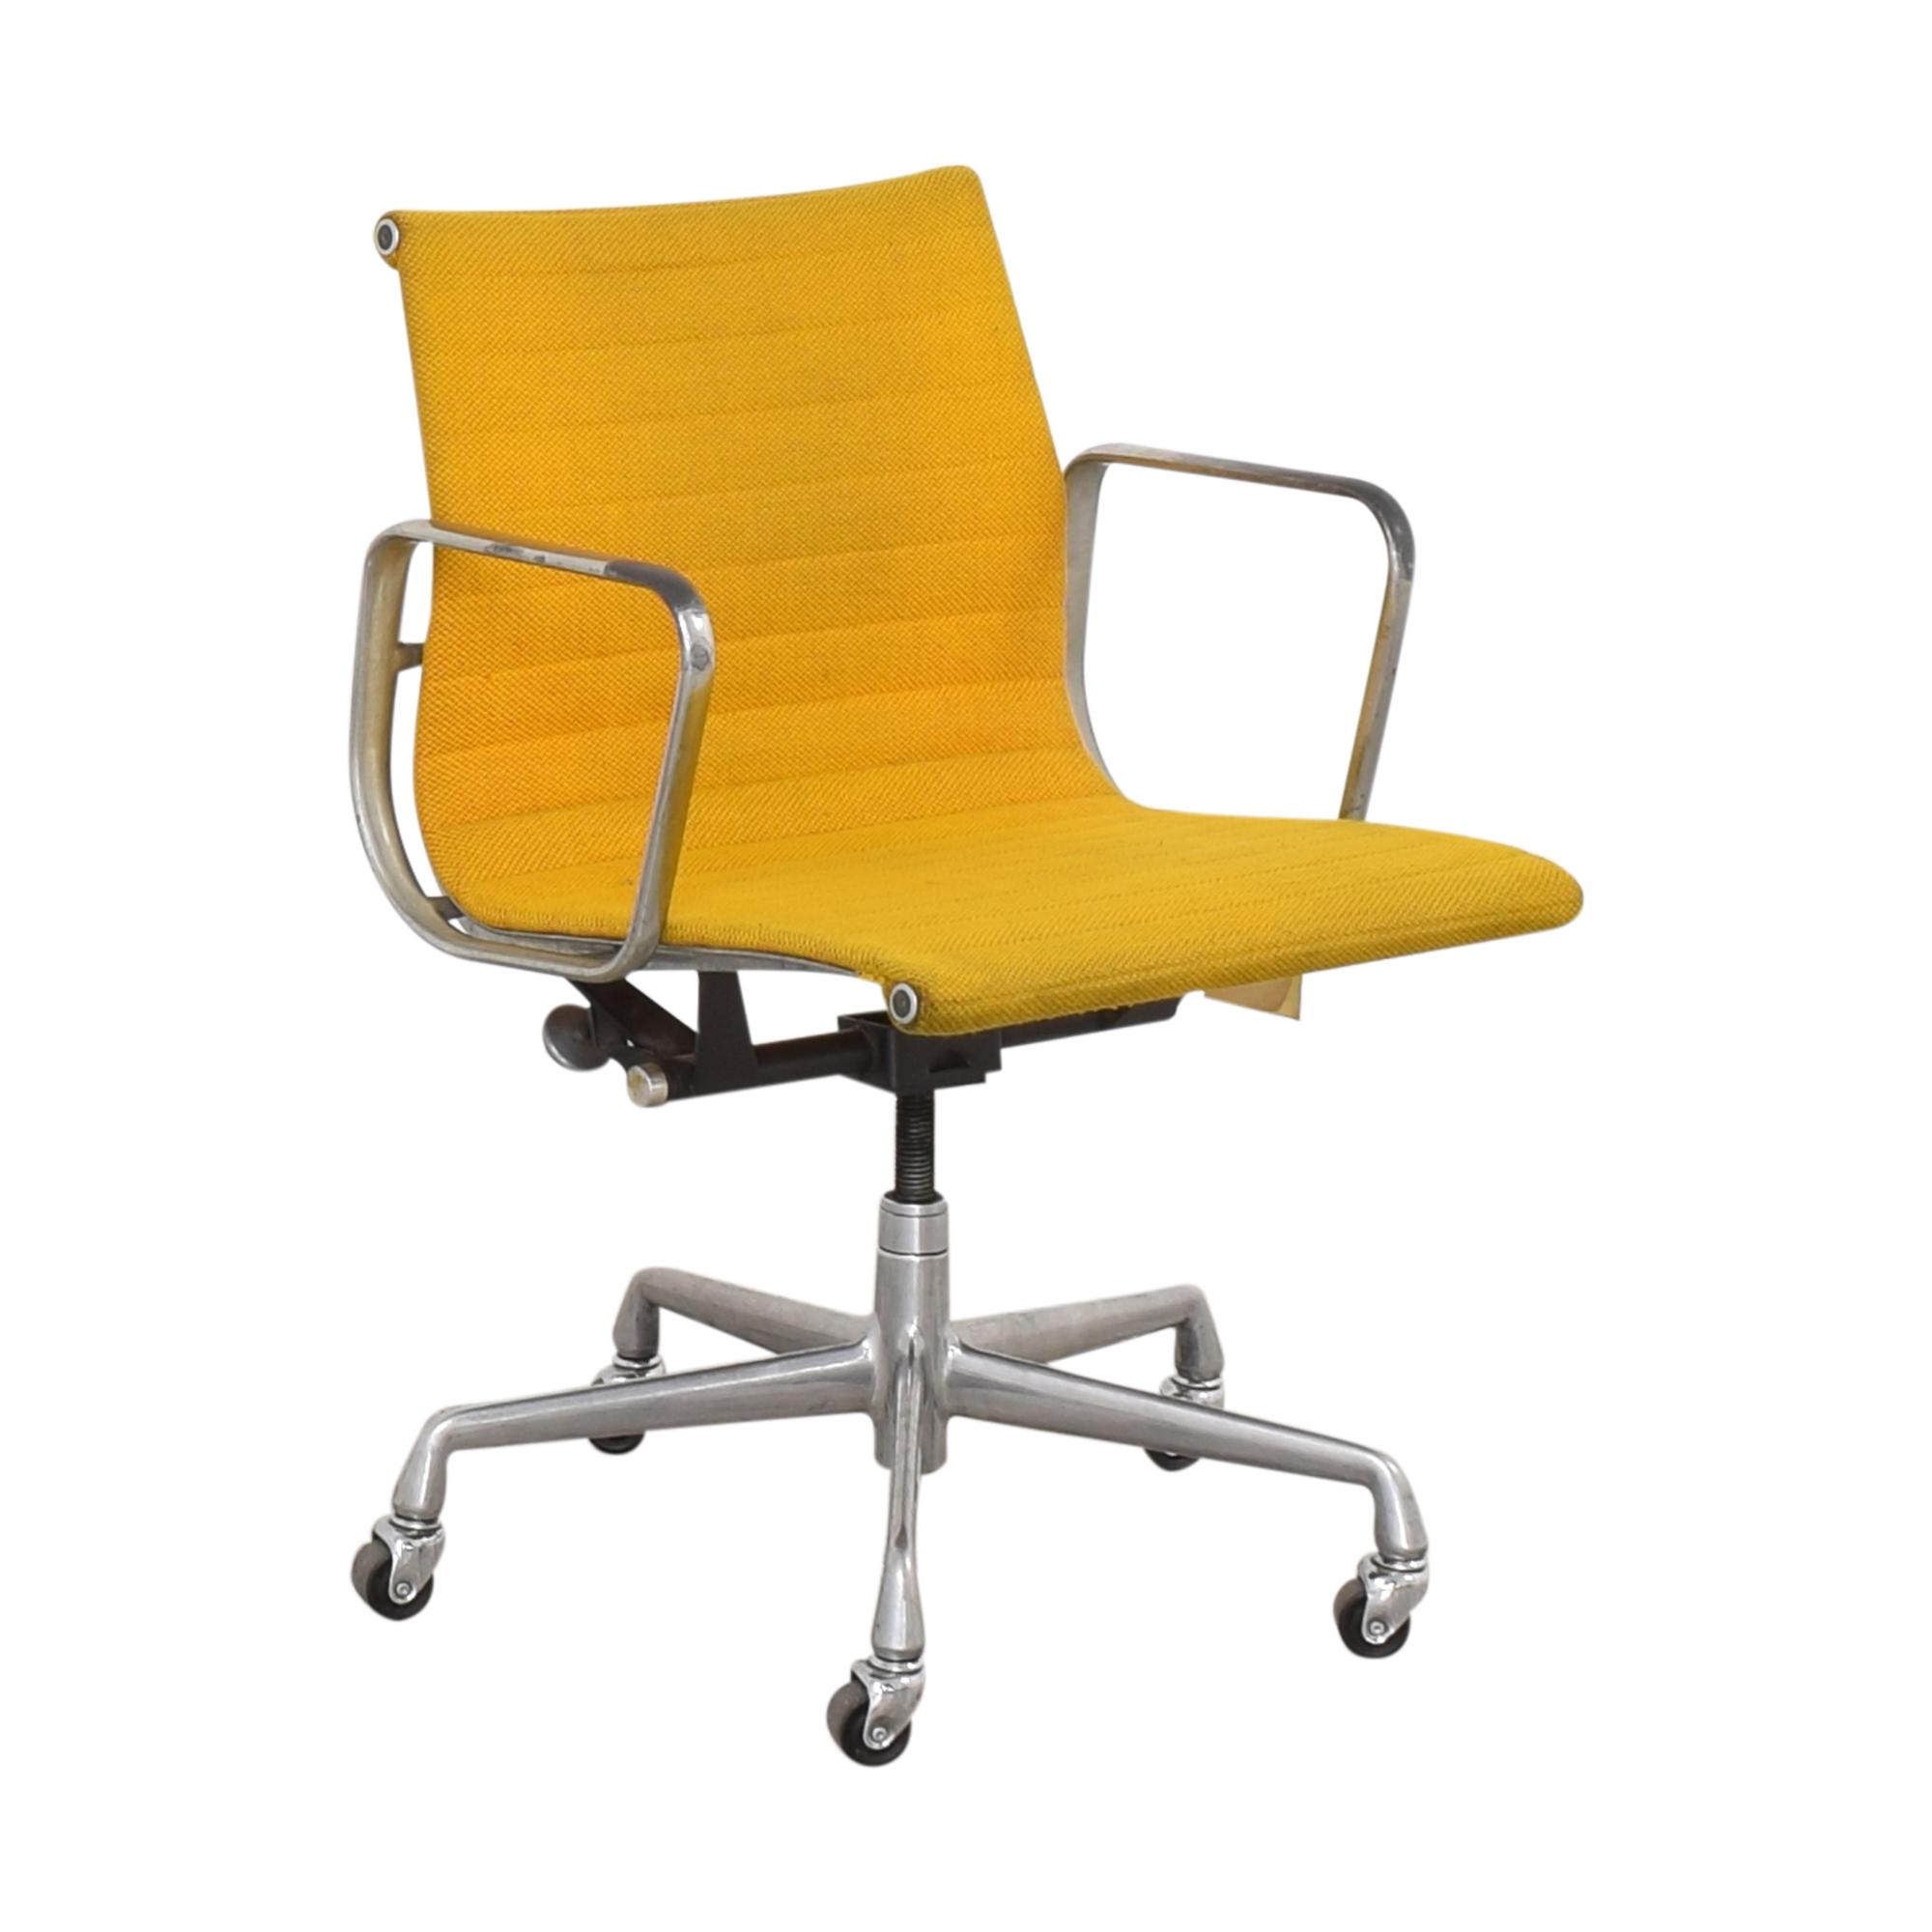 Herman Miller Herman Miller Eames Aluminum Group Management Chair discount